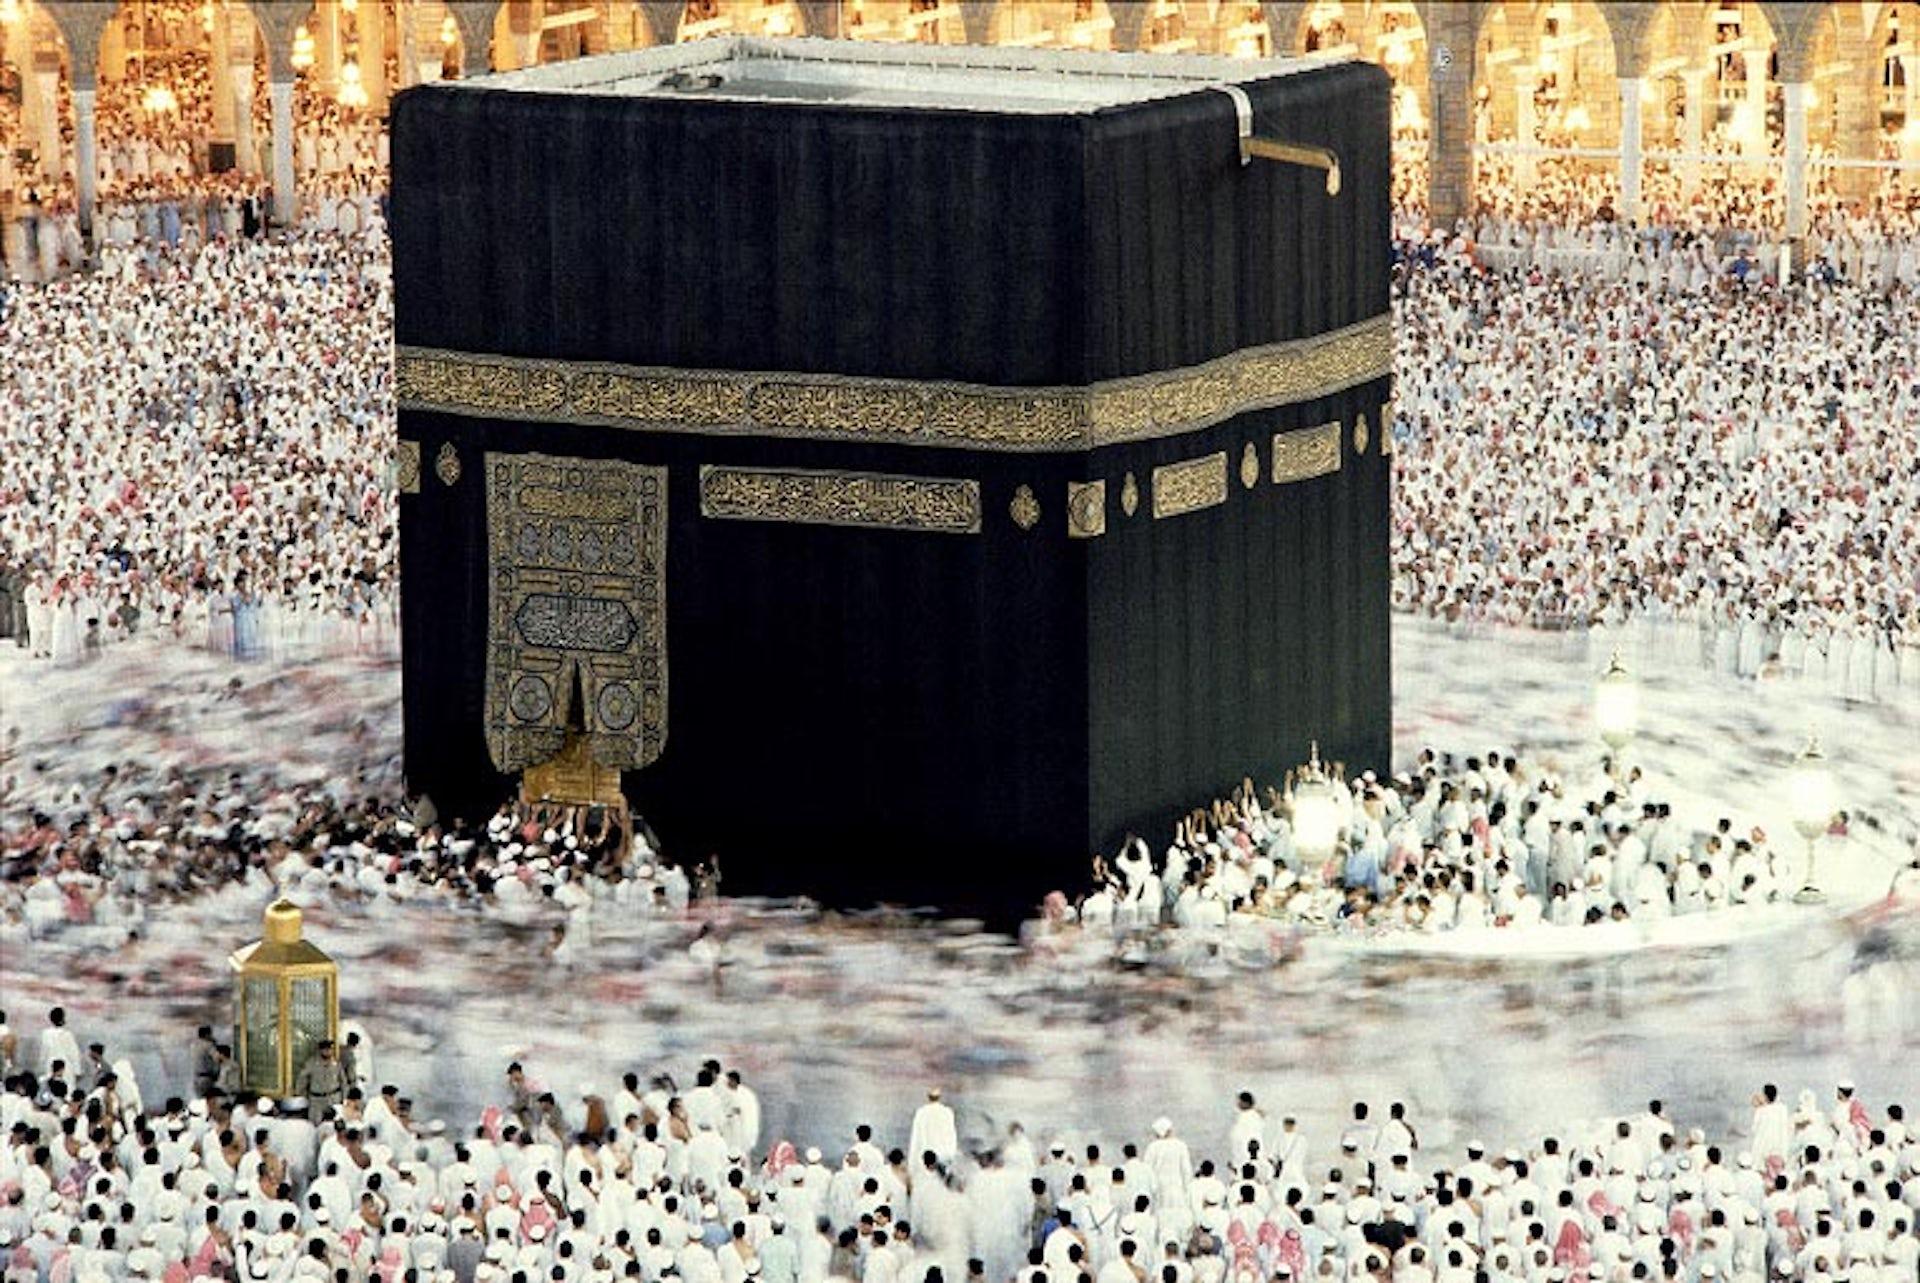 Pilgrims must circumambulate the Ka'ba anticlockwise seven times (tawaf). Peter